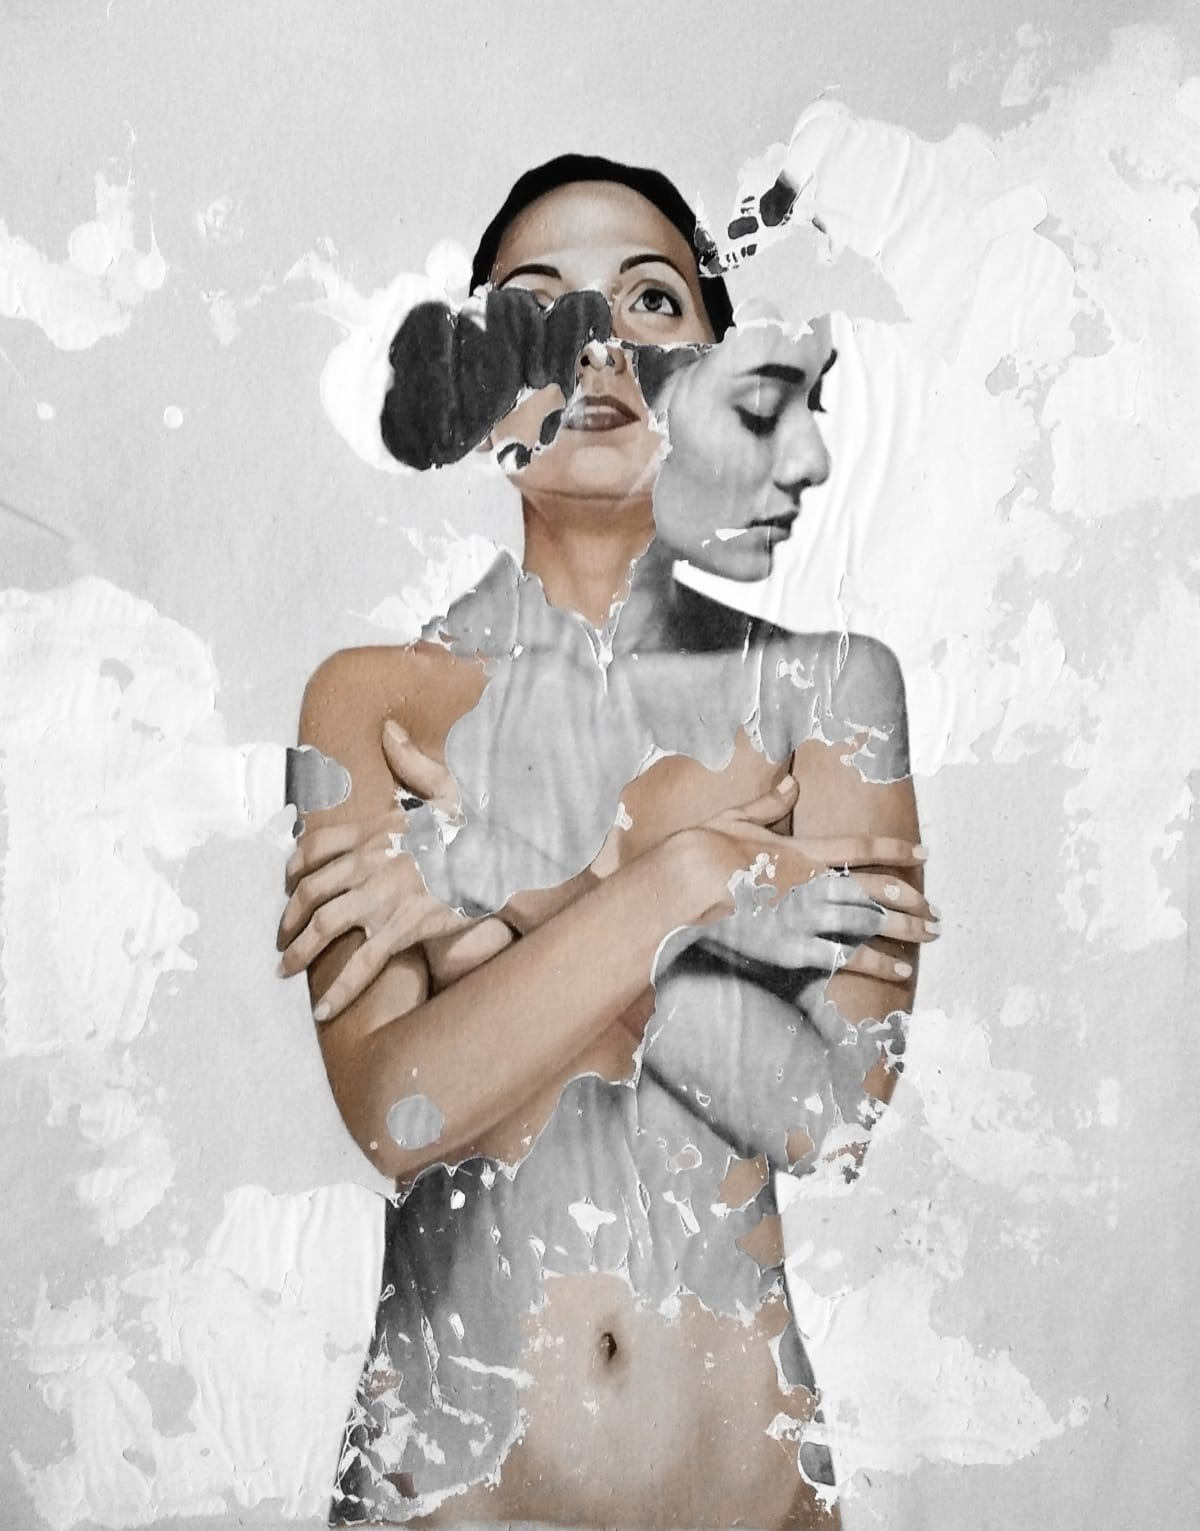 Raul Lara Spiritum Novum, 2018 Mixed media and image transfer on canvas 80 x 60 cm 31 1/2 x 23 1/2 in